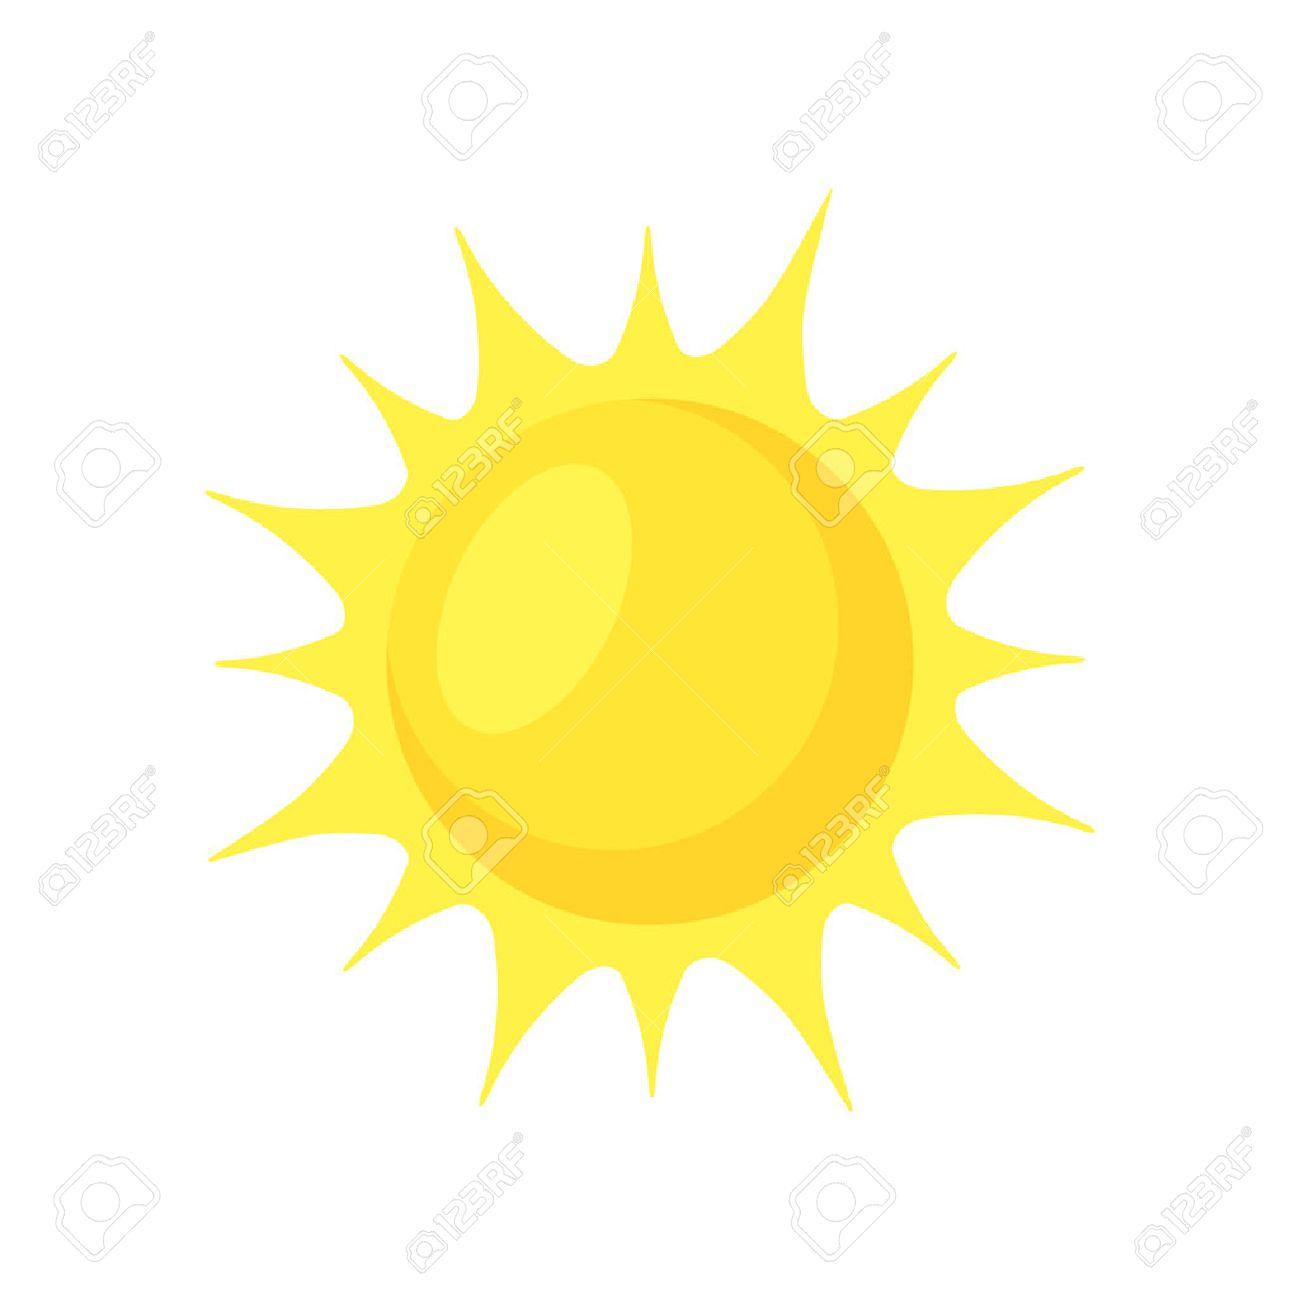 Sun shining. Stock Vector - 39847260